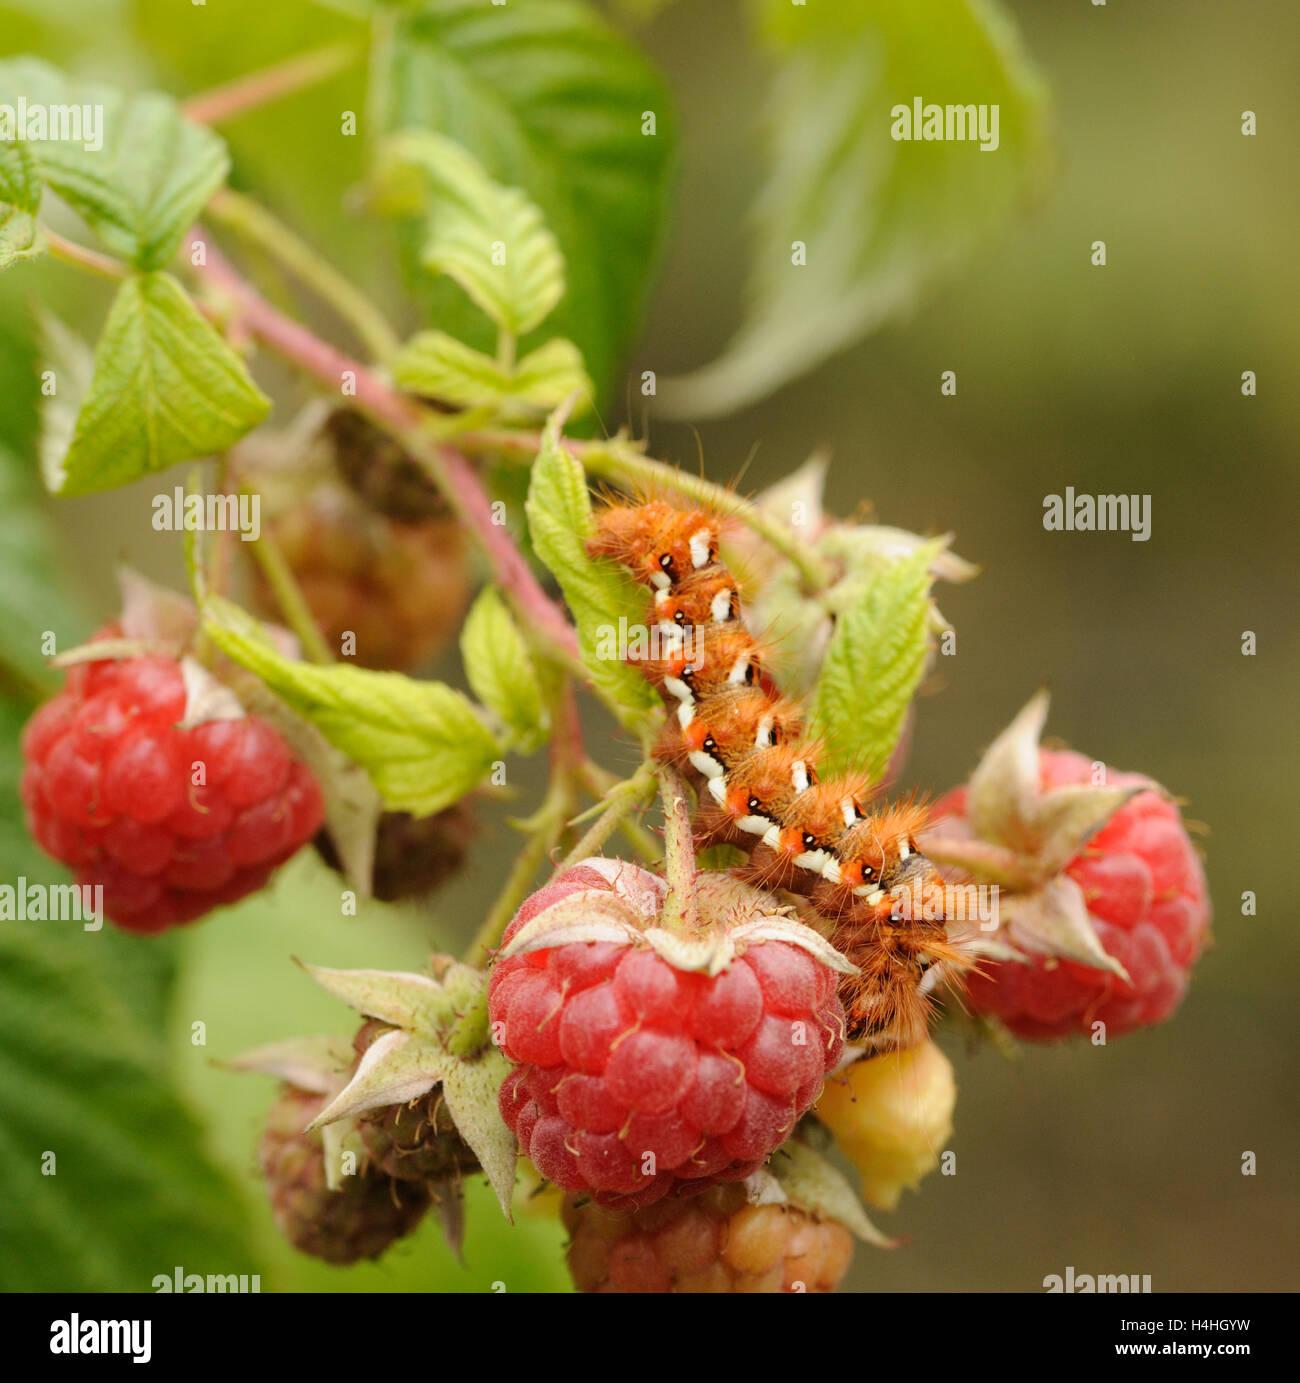 Caterpillar, lava, of  Knotgrass (Acronicta rumicis) moth on a cultivated raspberry (Rubus idaeus) plant. Bedgebury - Stock Image